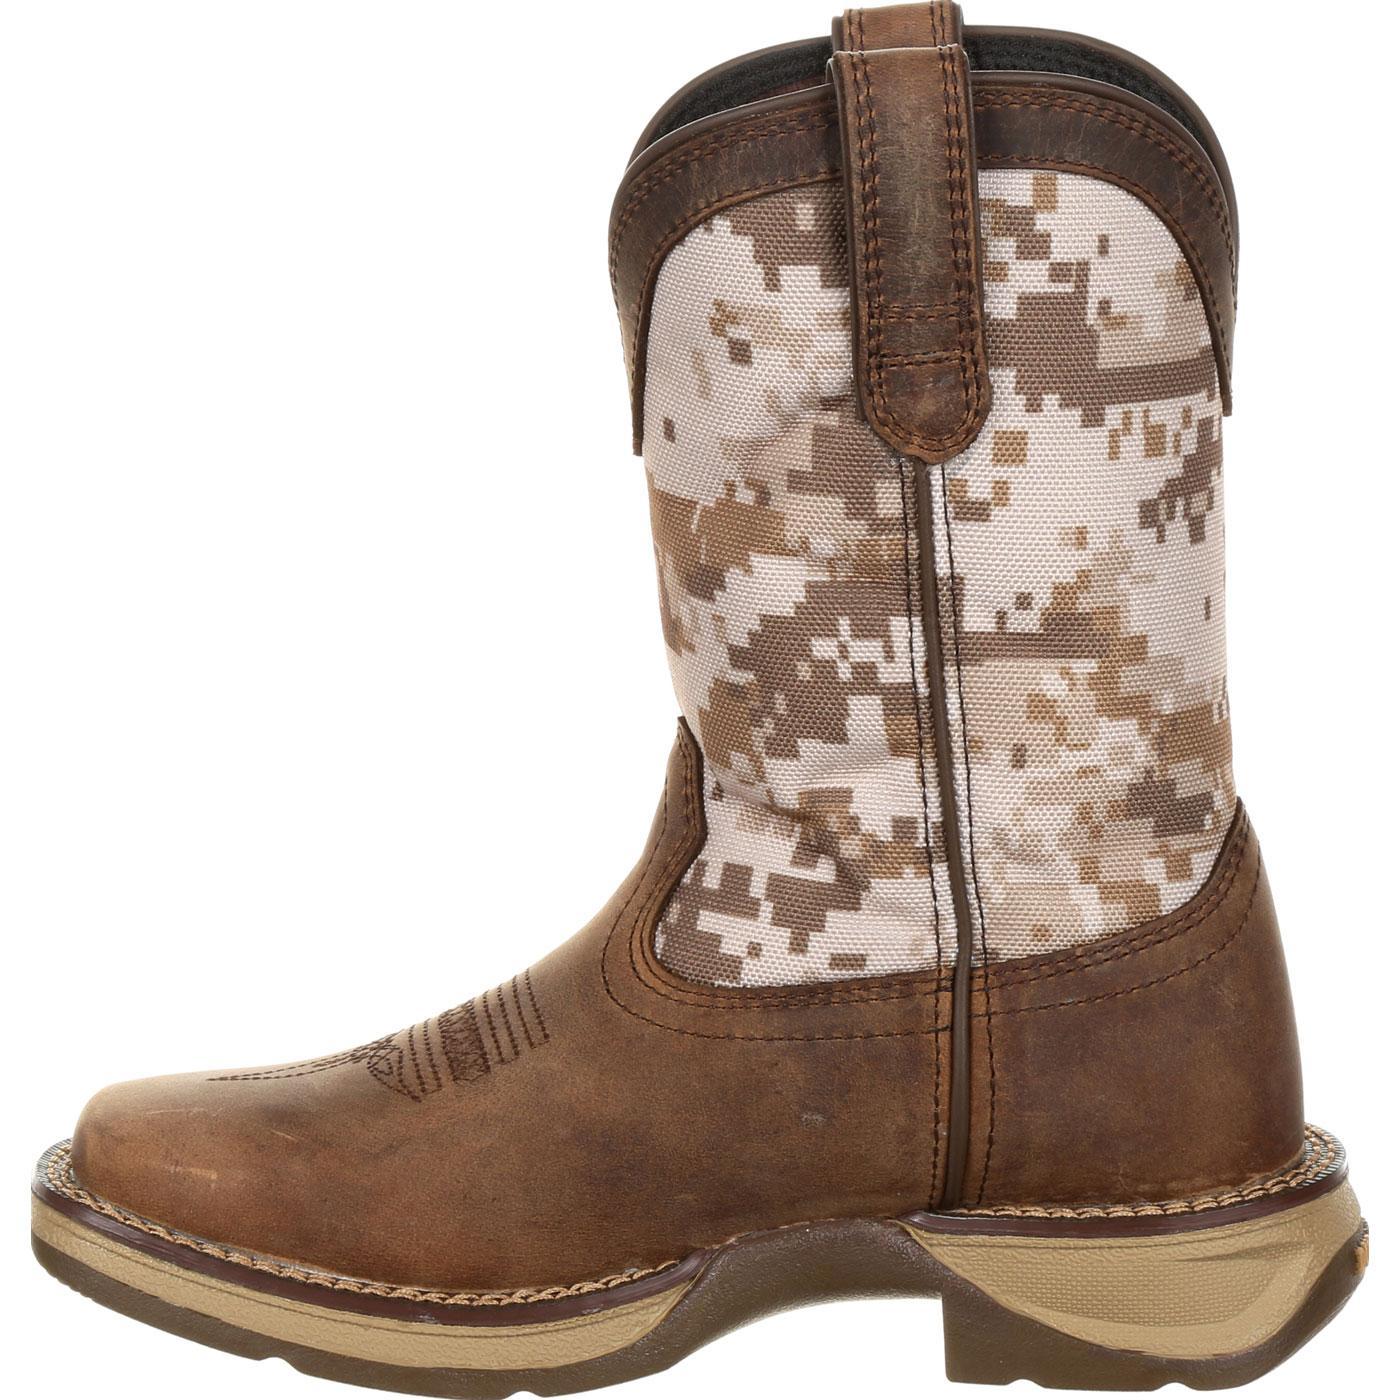 086d7c3cd96d9 Images. Lil' Rebel by Durango Little Kids Desert Camo Western Boot ...